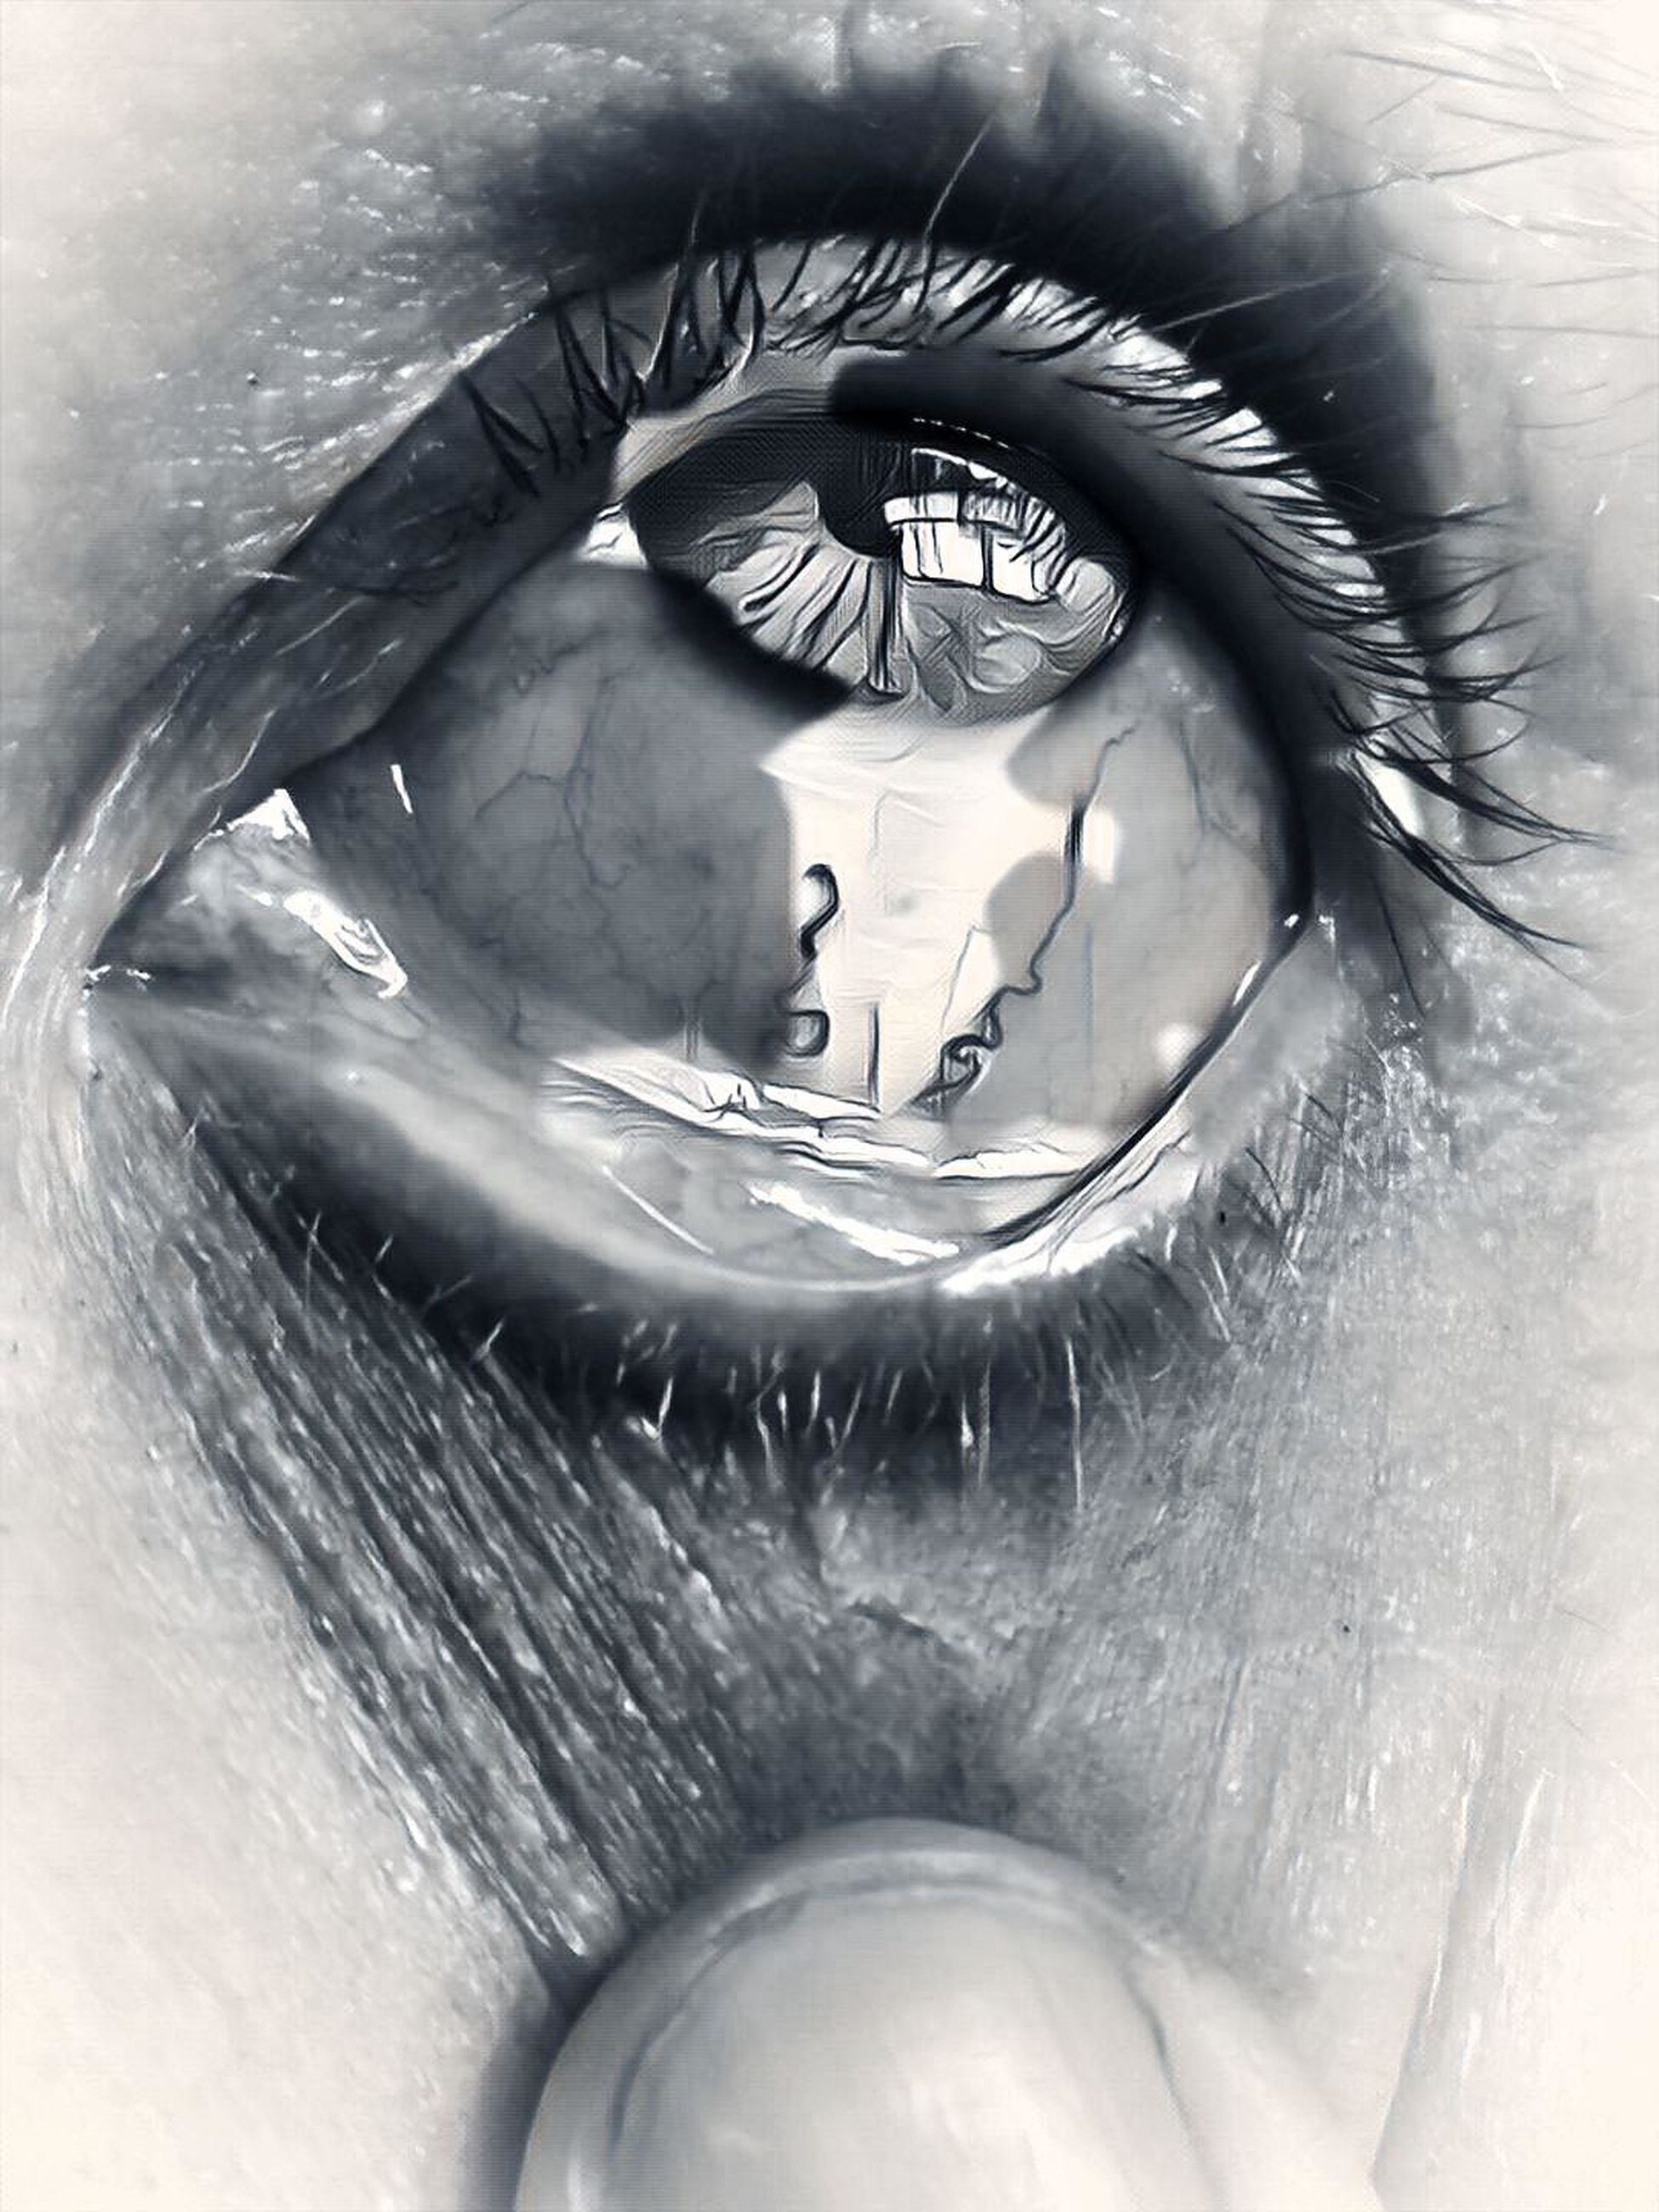 close-up, eyelash, reflection, human body part, human eye, extreme close-up, eyesight, one person, body part, eye, sensory perception, real people, full frame, human face, young adult, indoors, macro, eyeball, adult, iris - eye, eyebrow